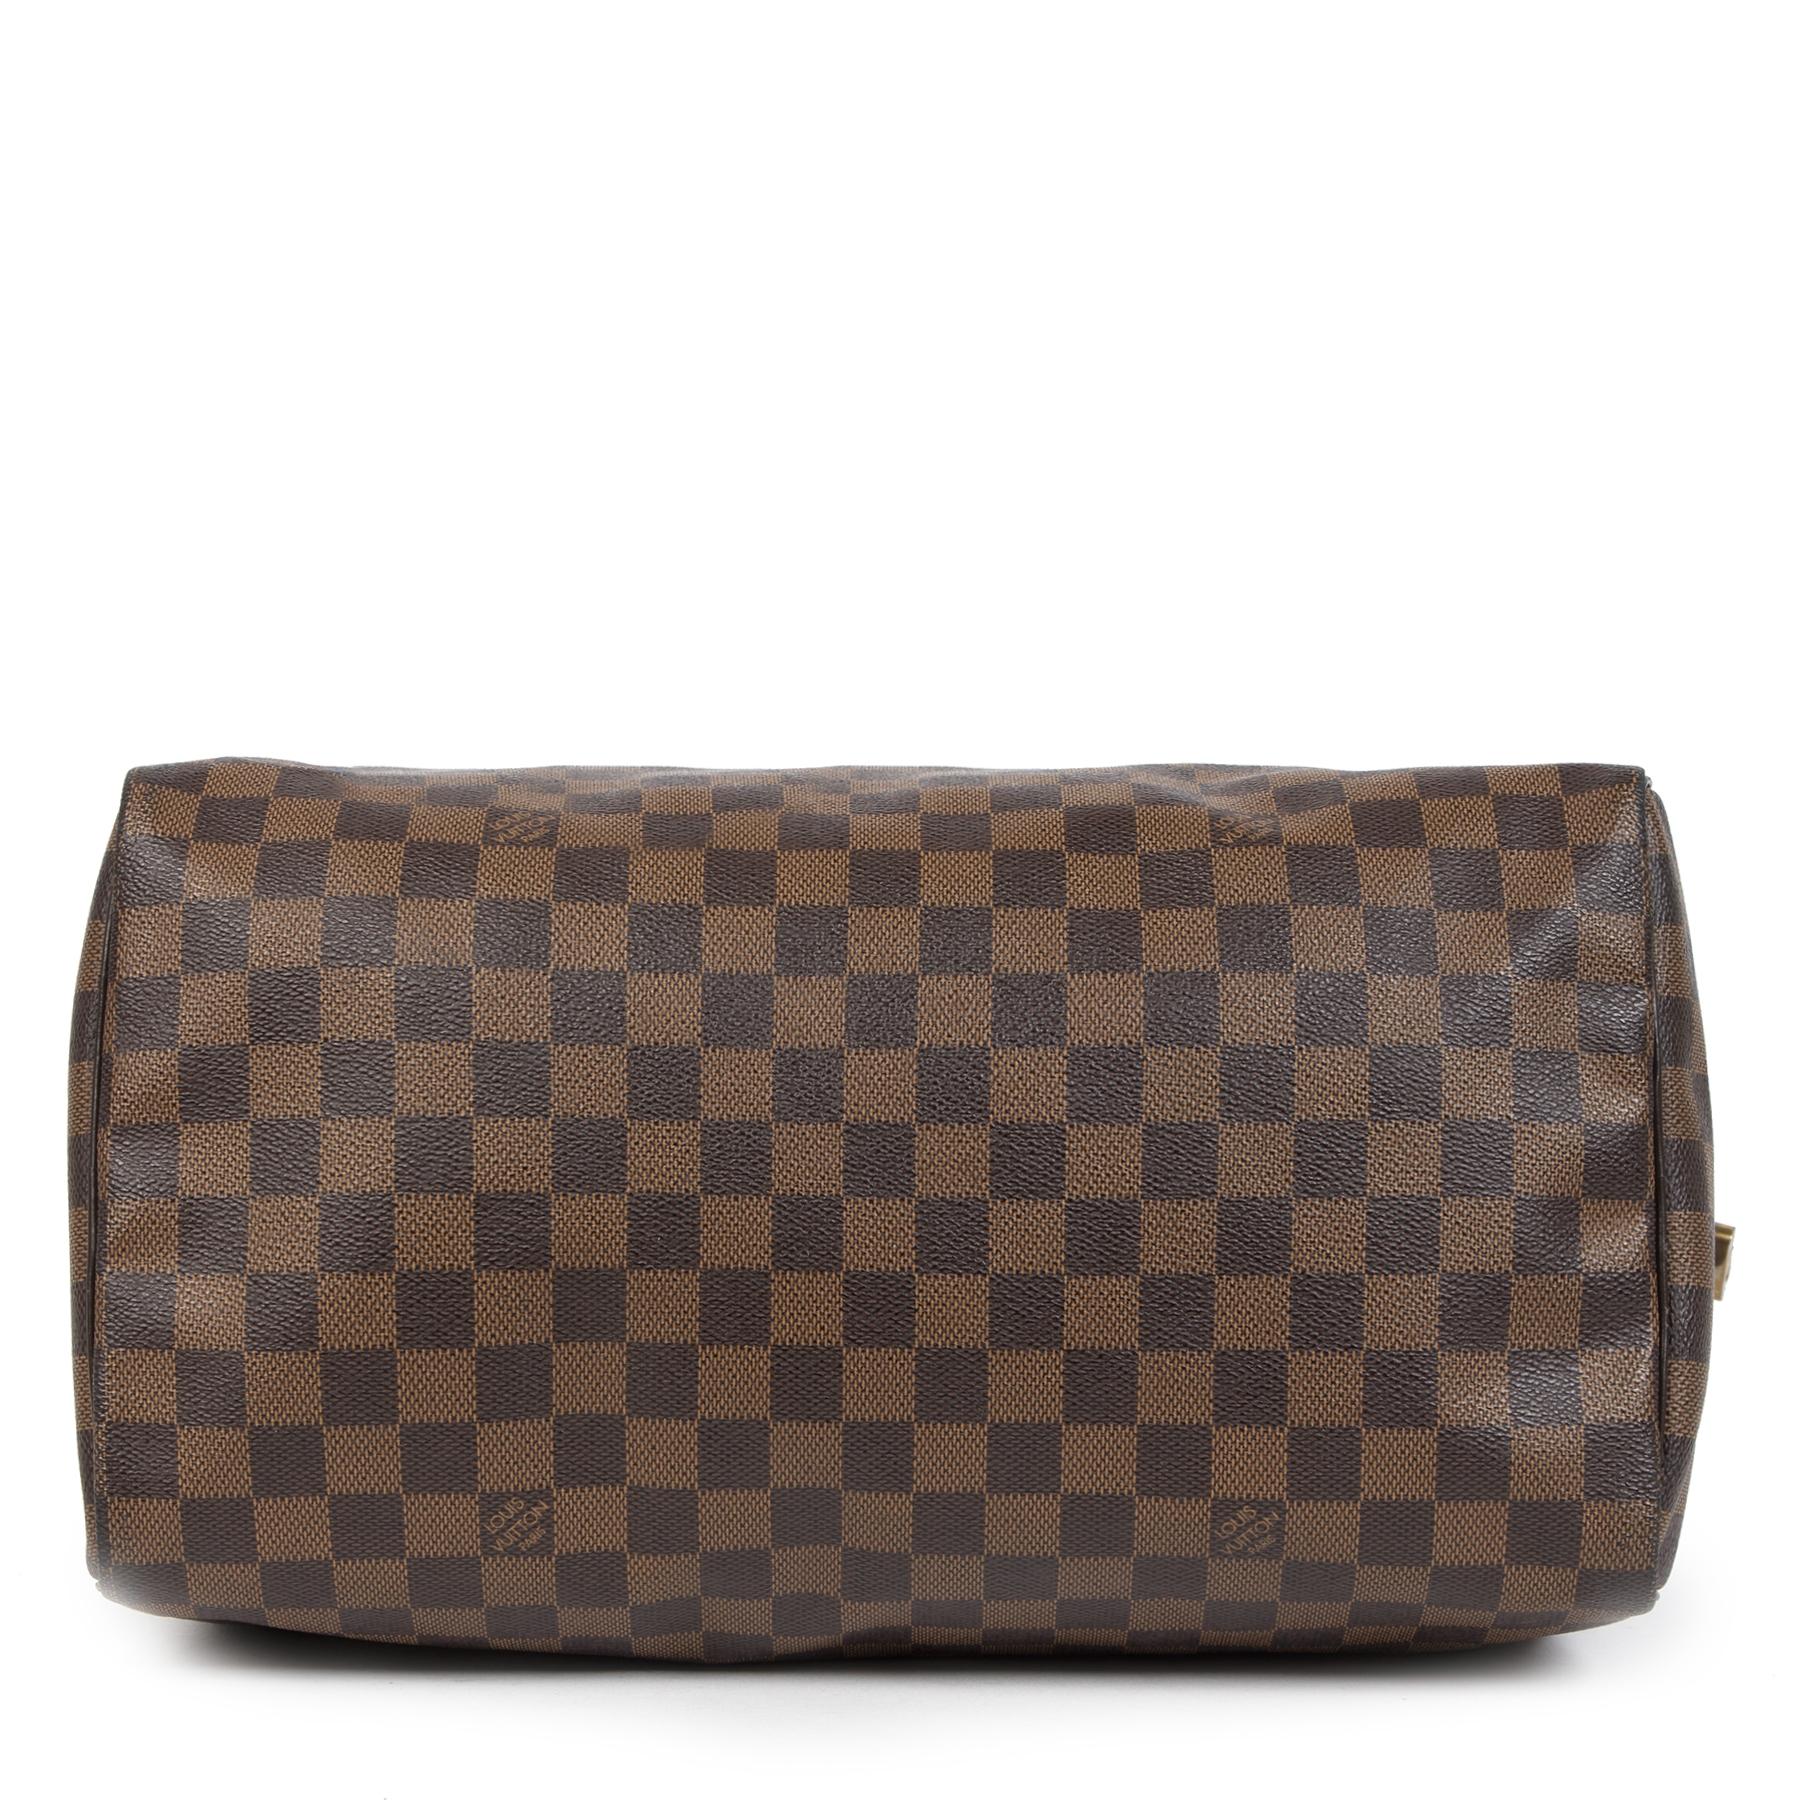 Authentieke tweedehands vintage Louis Vuitton Damier Ebene 35 Speedy koop online webshop LabelLOV